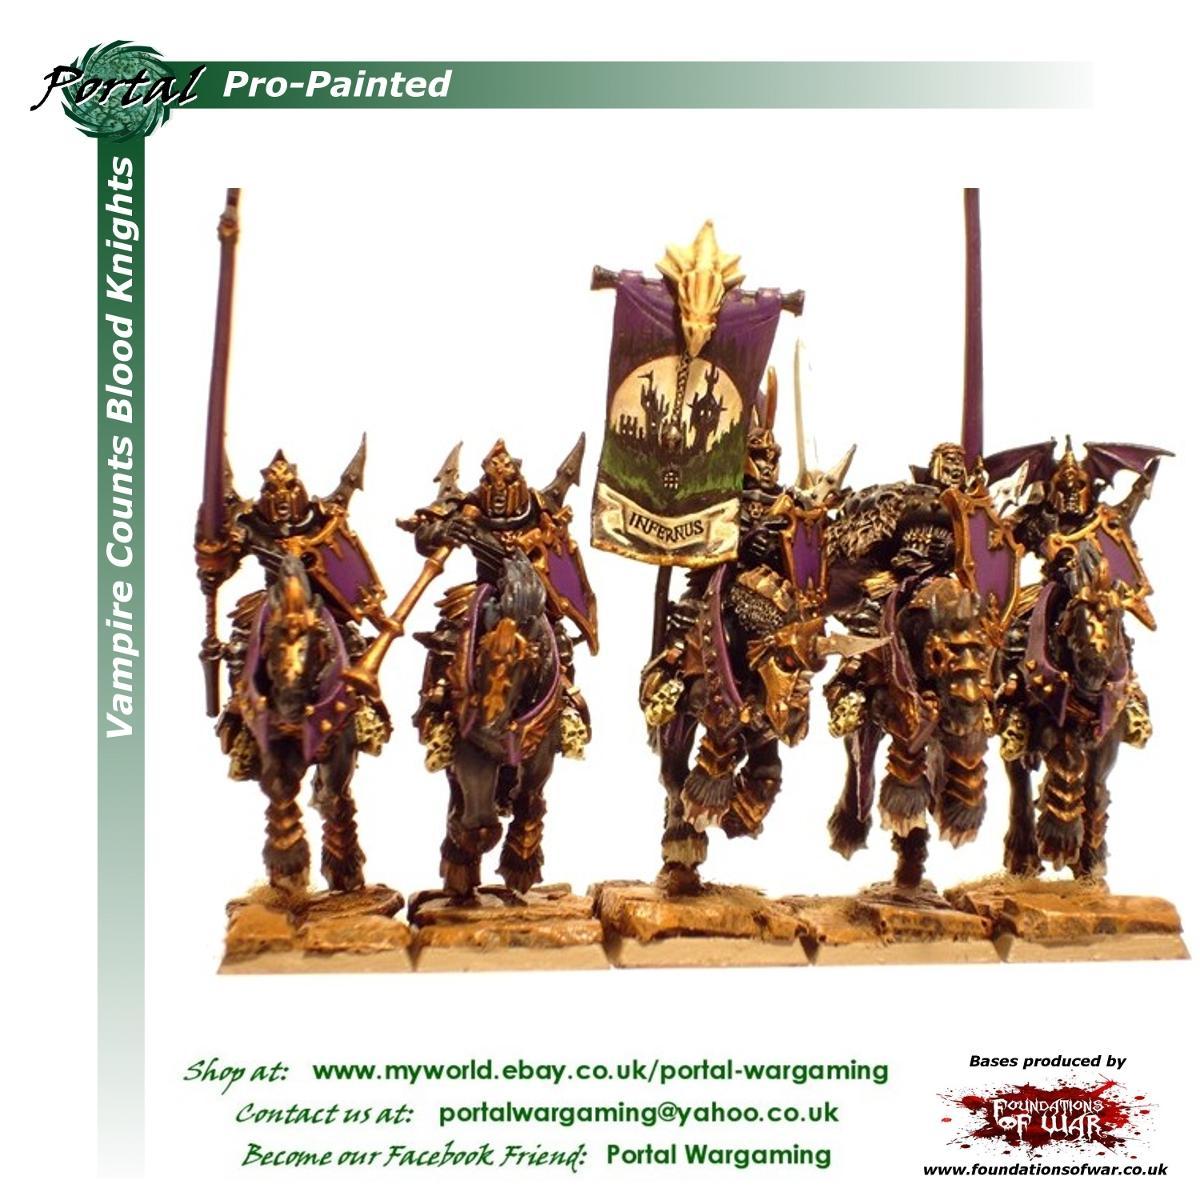 Pro-painted, Vampire Counts, Warhammer Fantasy, Wfb